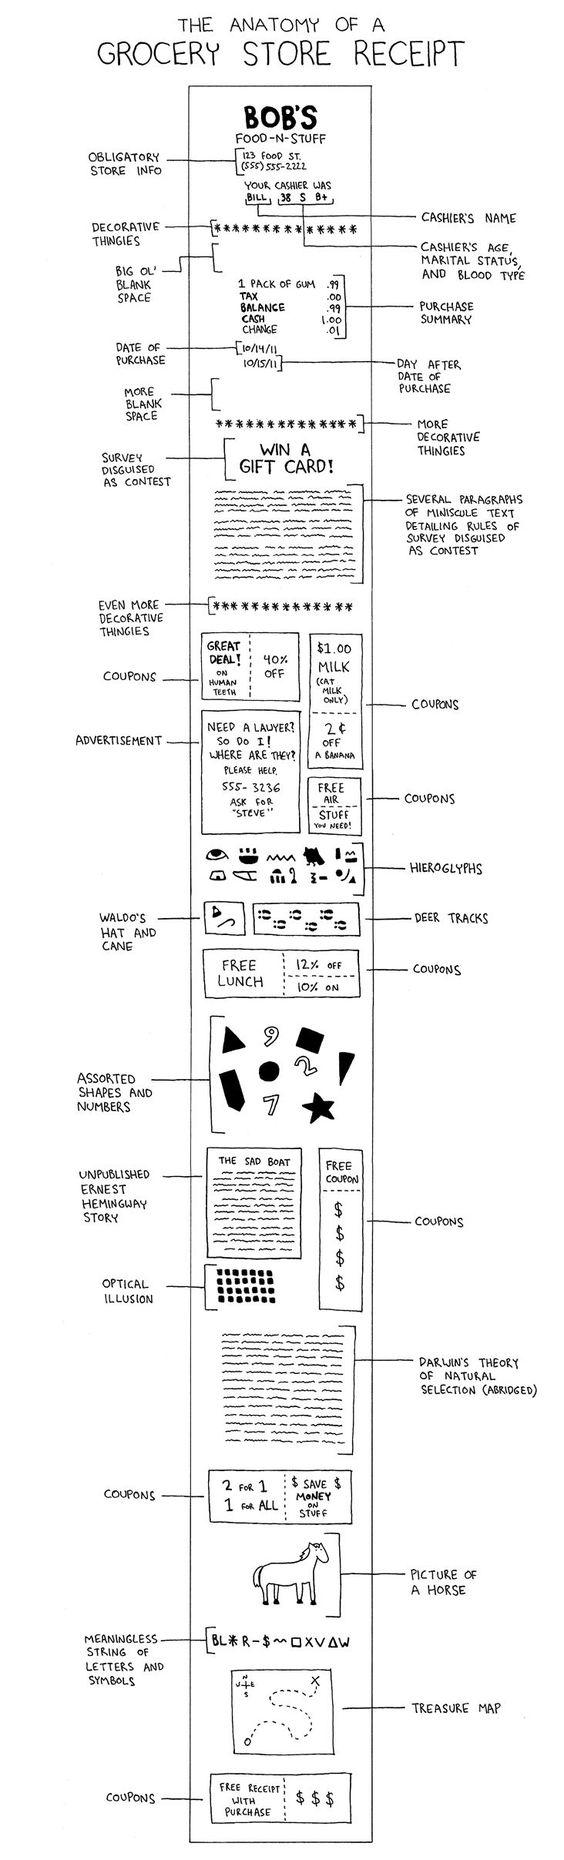 Anatomy of a grocery store receipt.